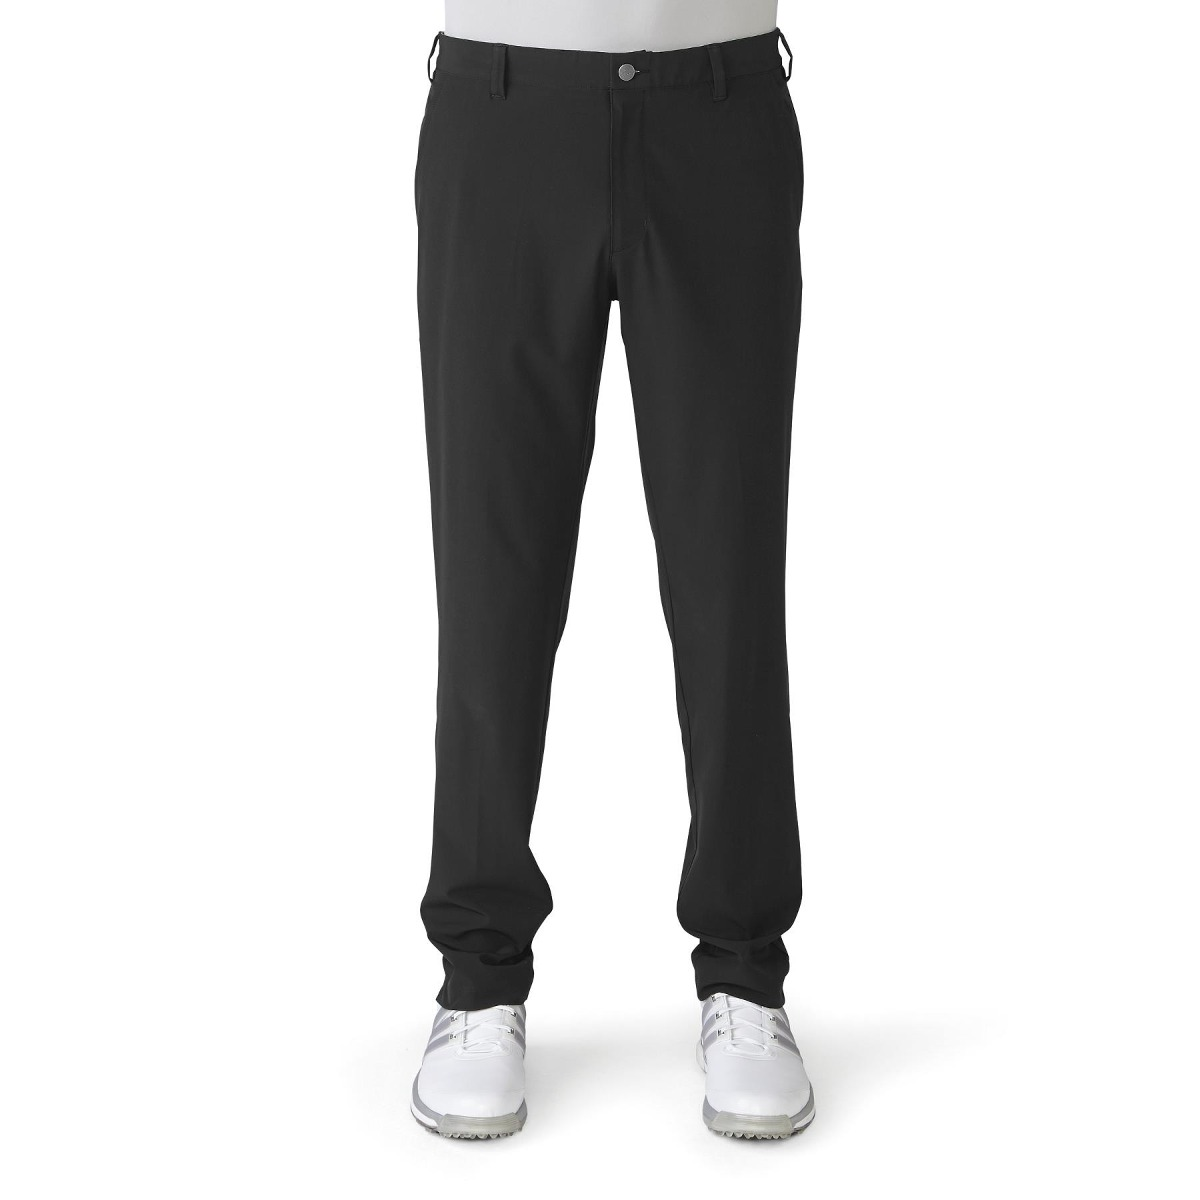 96341095d505d tati golf pantalon adidas recto negro. Cargando zoom.